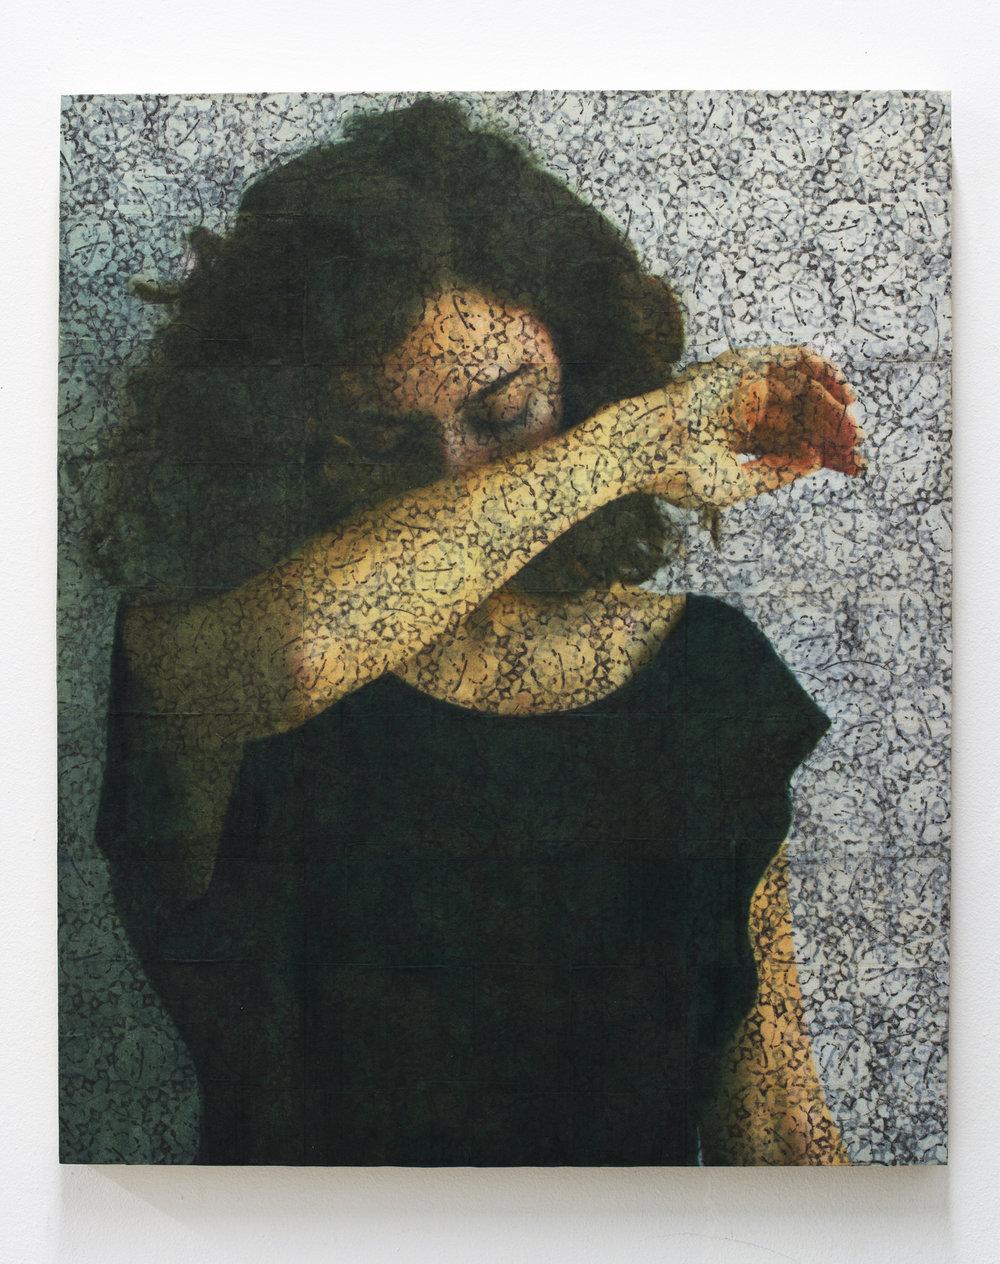 Mohr Portrait 2015 - 6 - Sepideh Salehi - 20x24